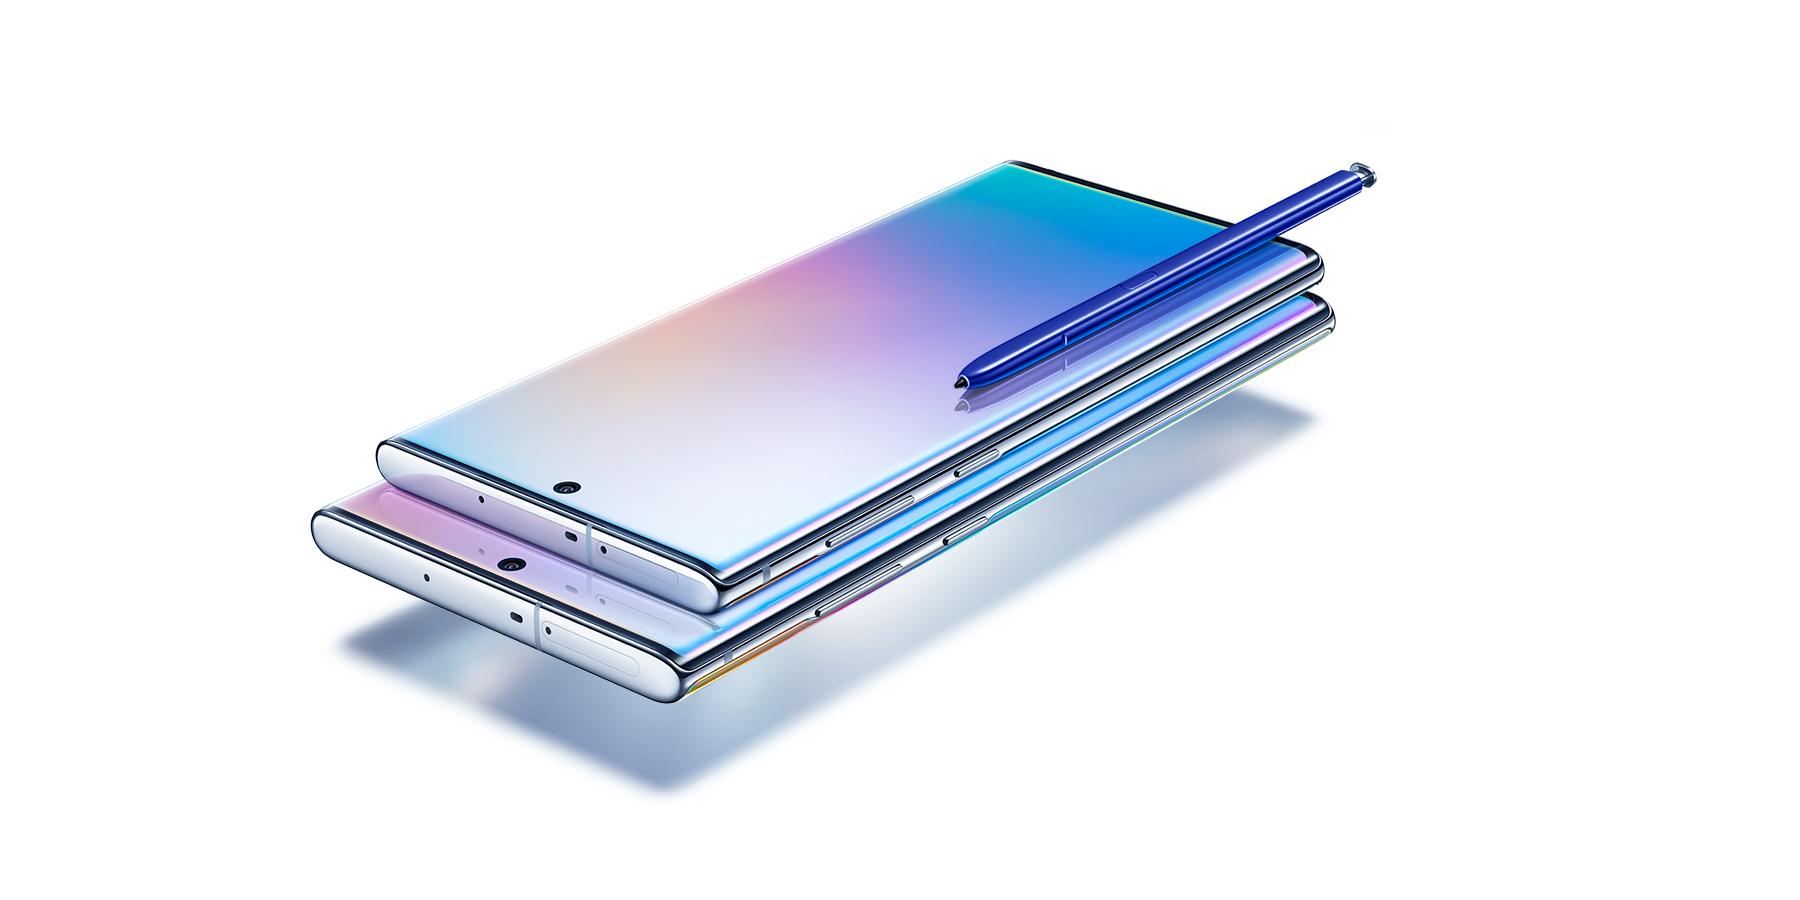 Samsung Galaxy Note 10 plus N975Fd 256GB Dual sim FULL PACK فول پک